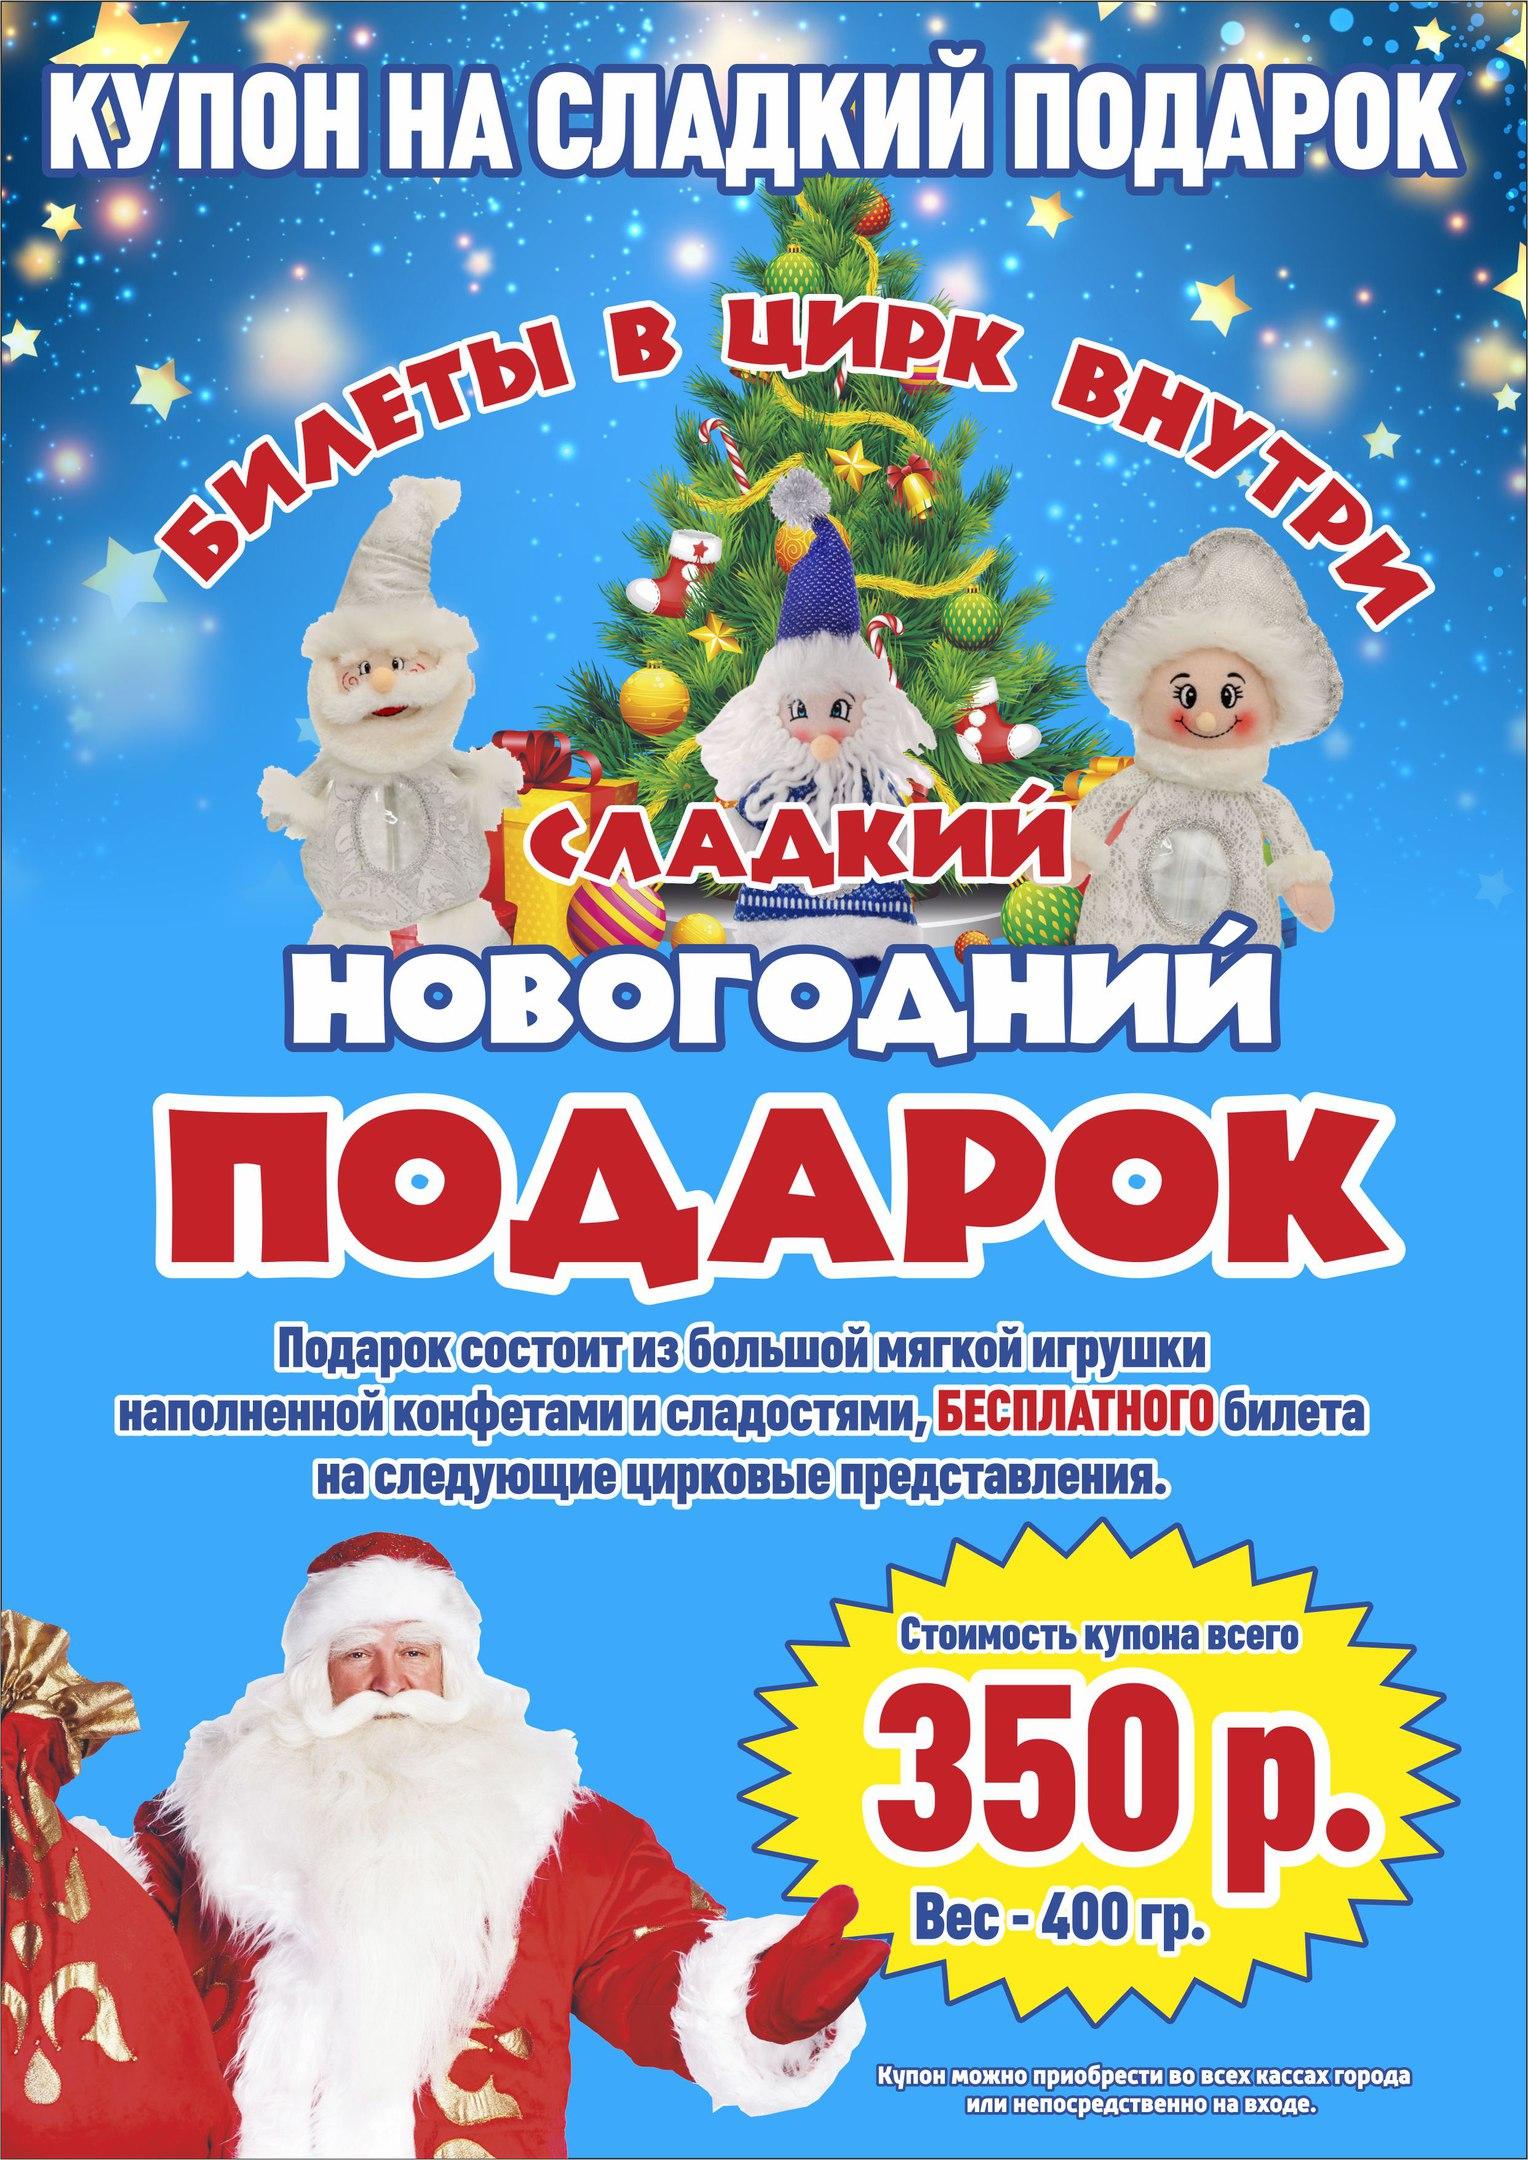 Новогодний Цирковой Карнавал